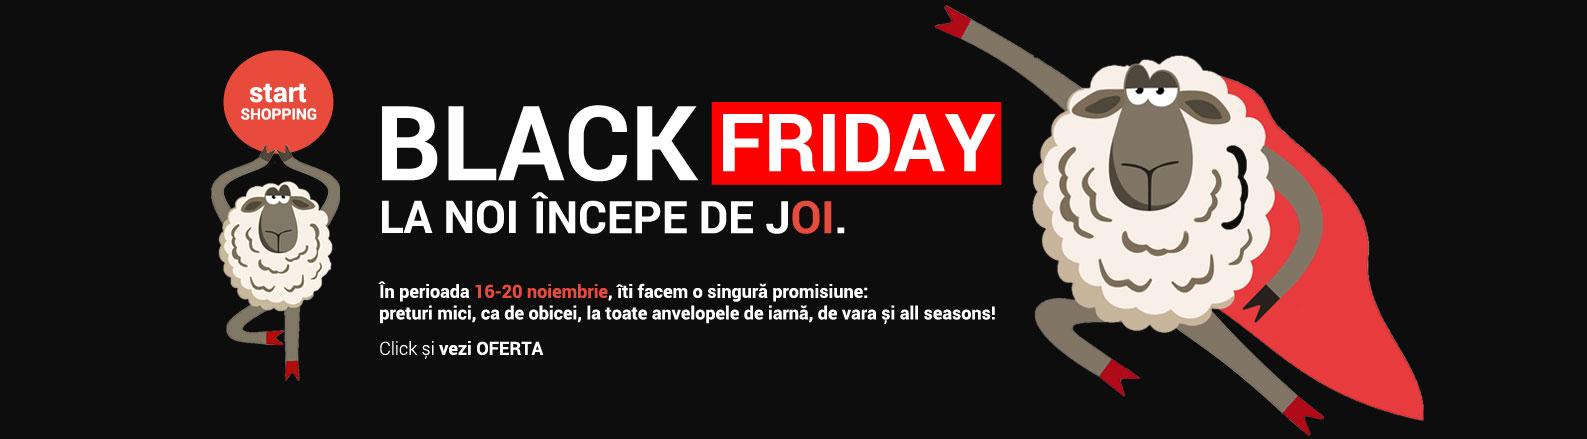 Anvelope Black Friday